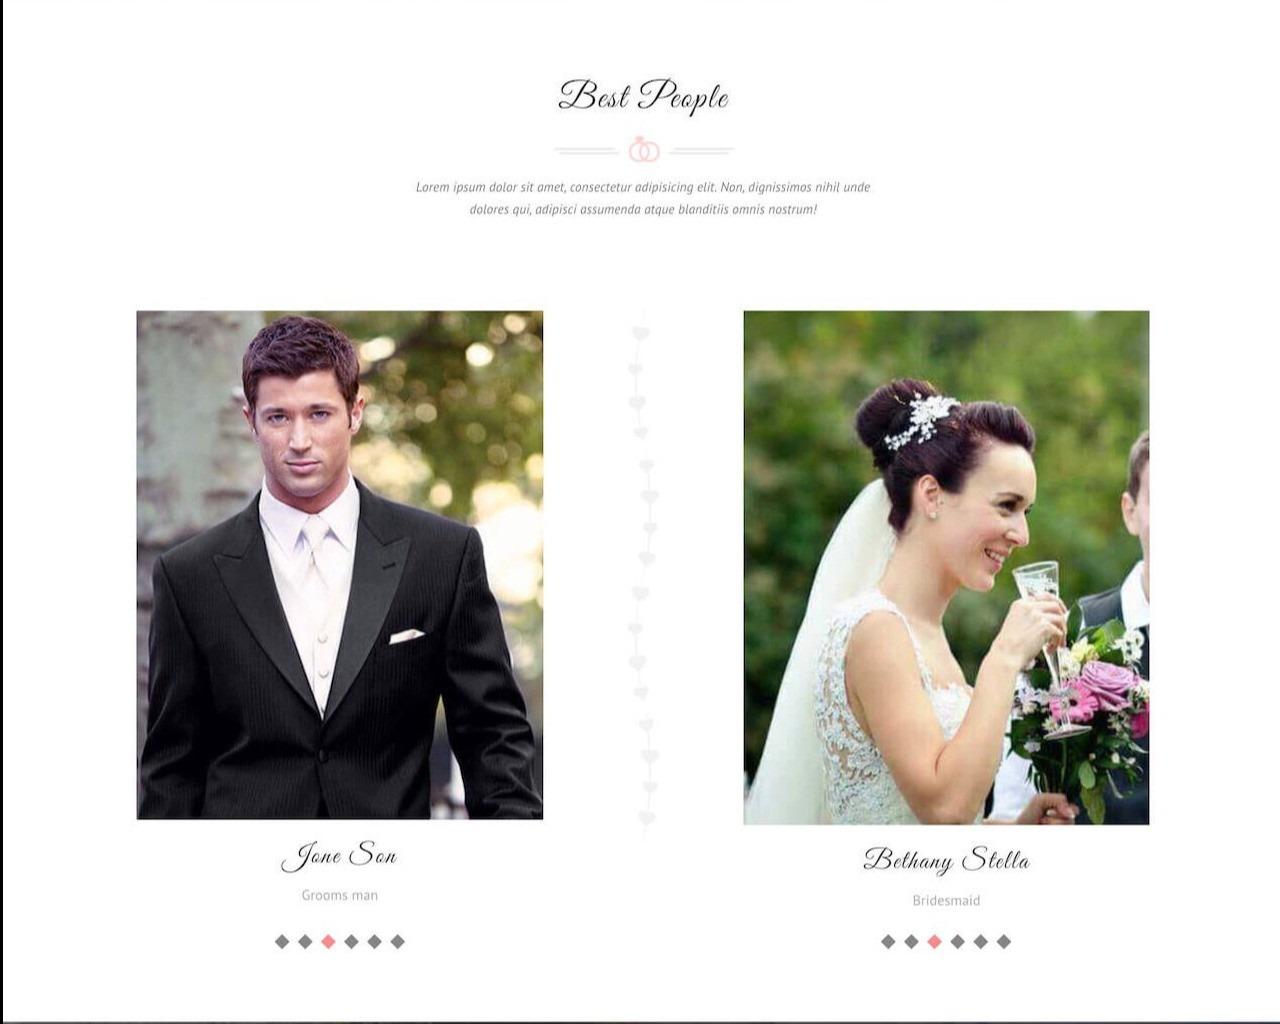 Website Wedding - Chúc mừng đám cưới